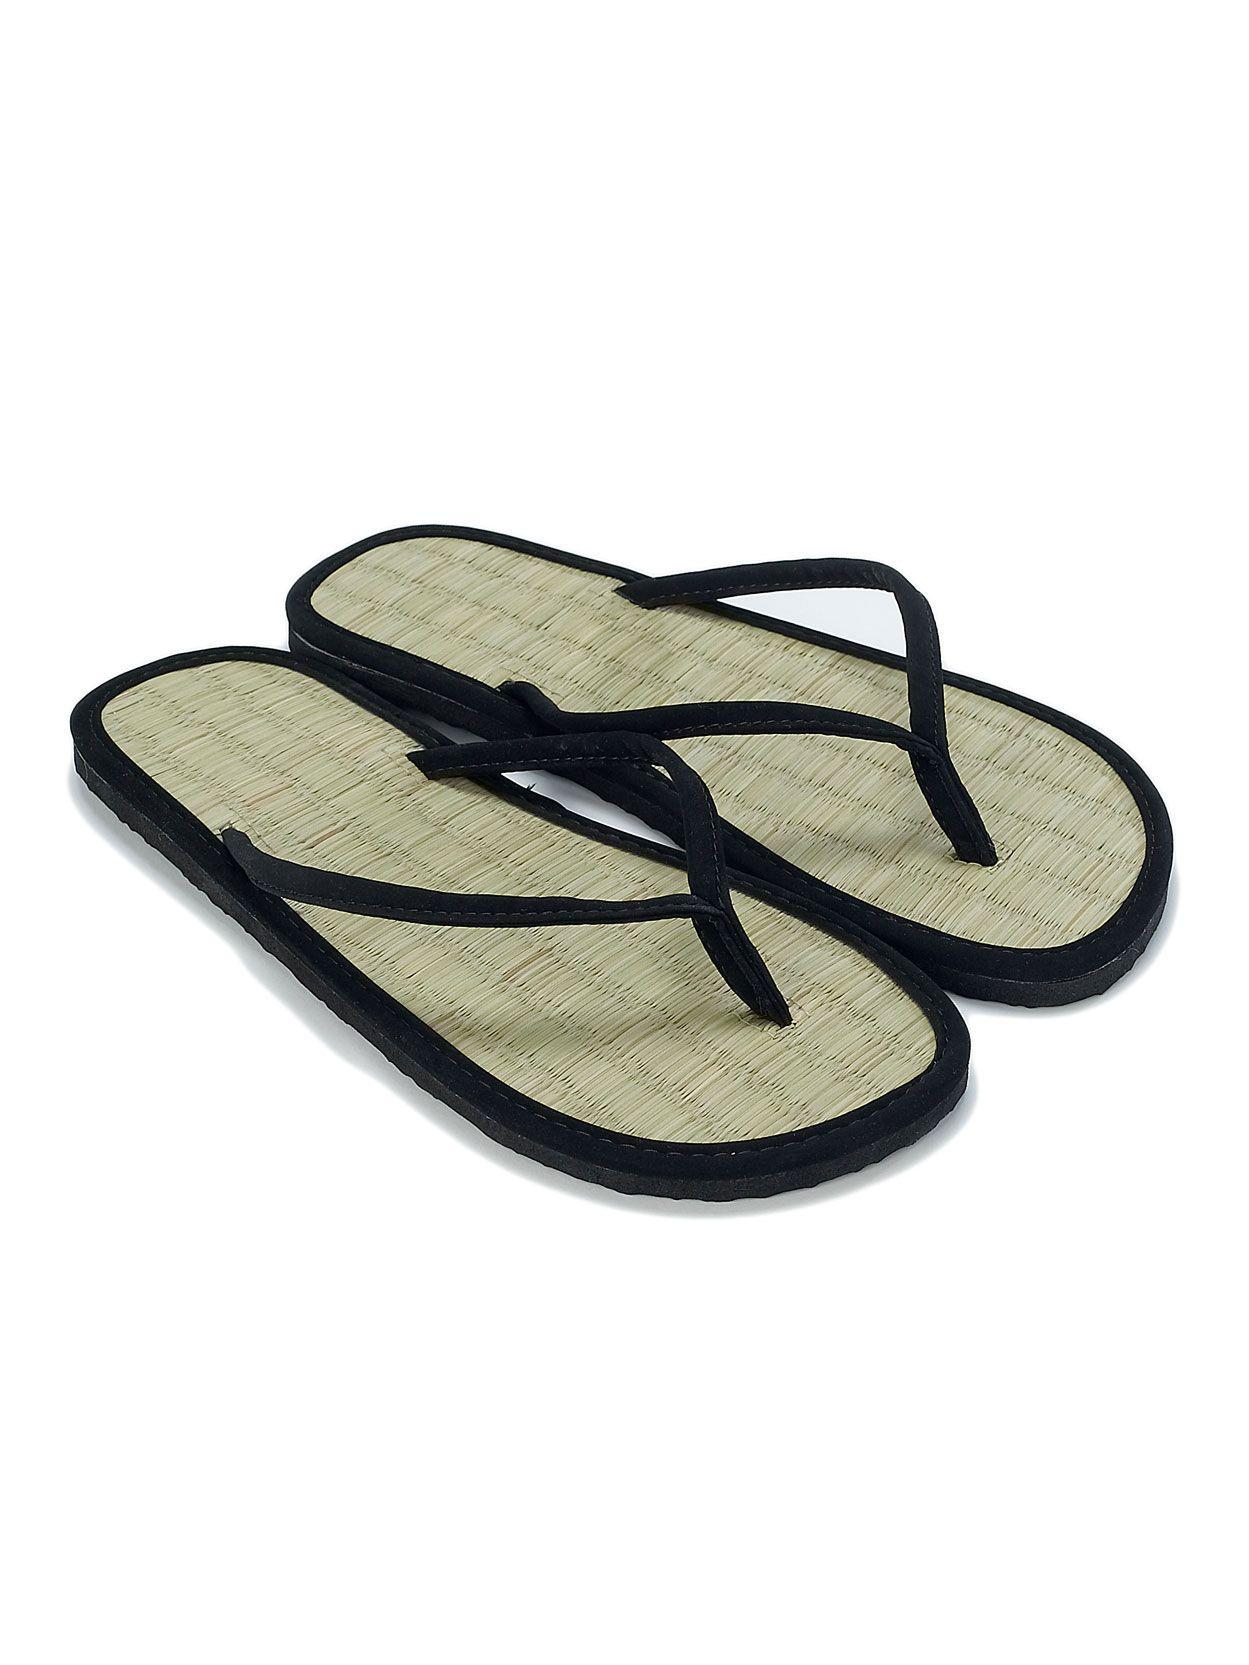 13b74976a Plain Seagrass Flip Flop